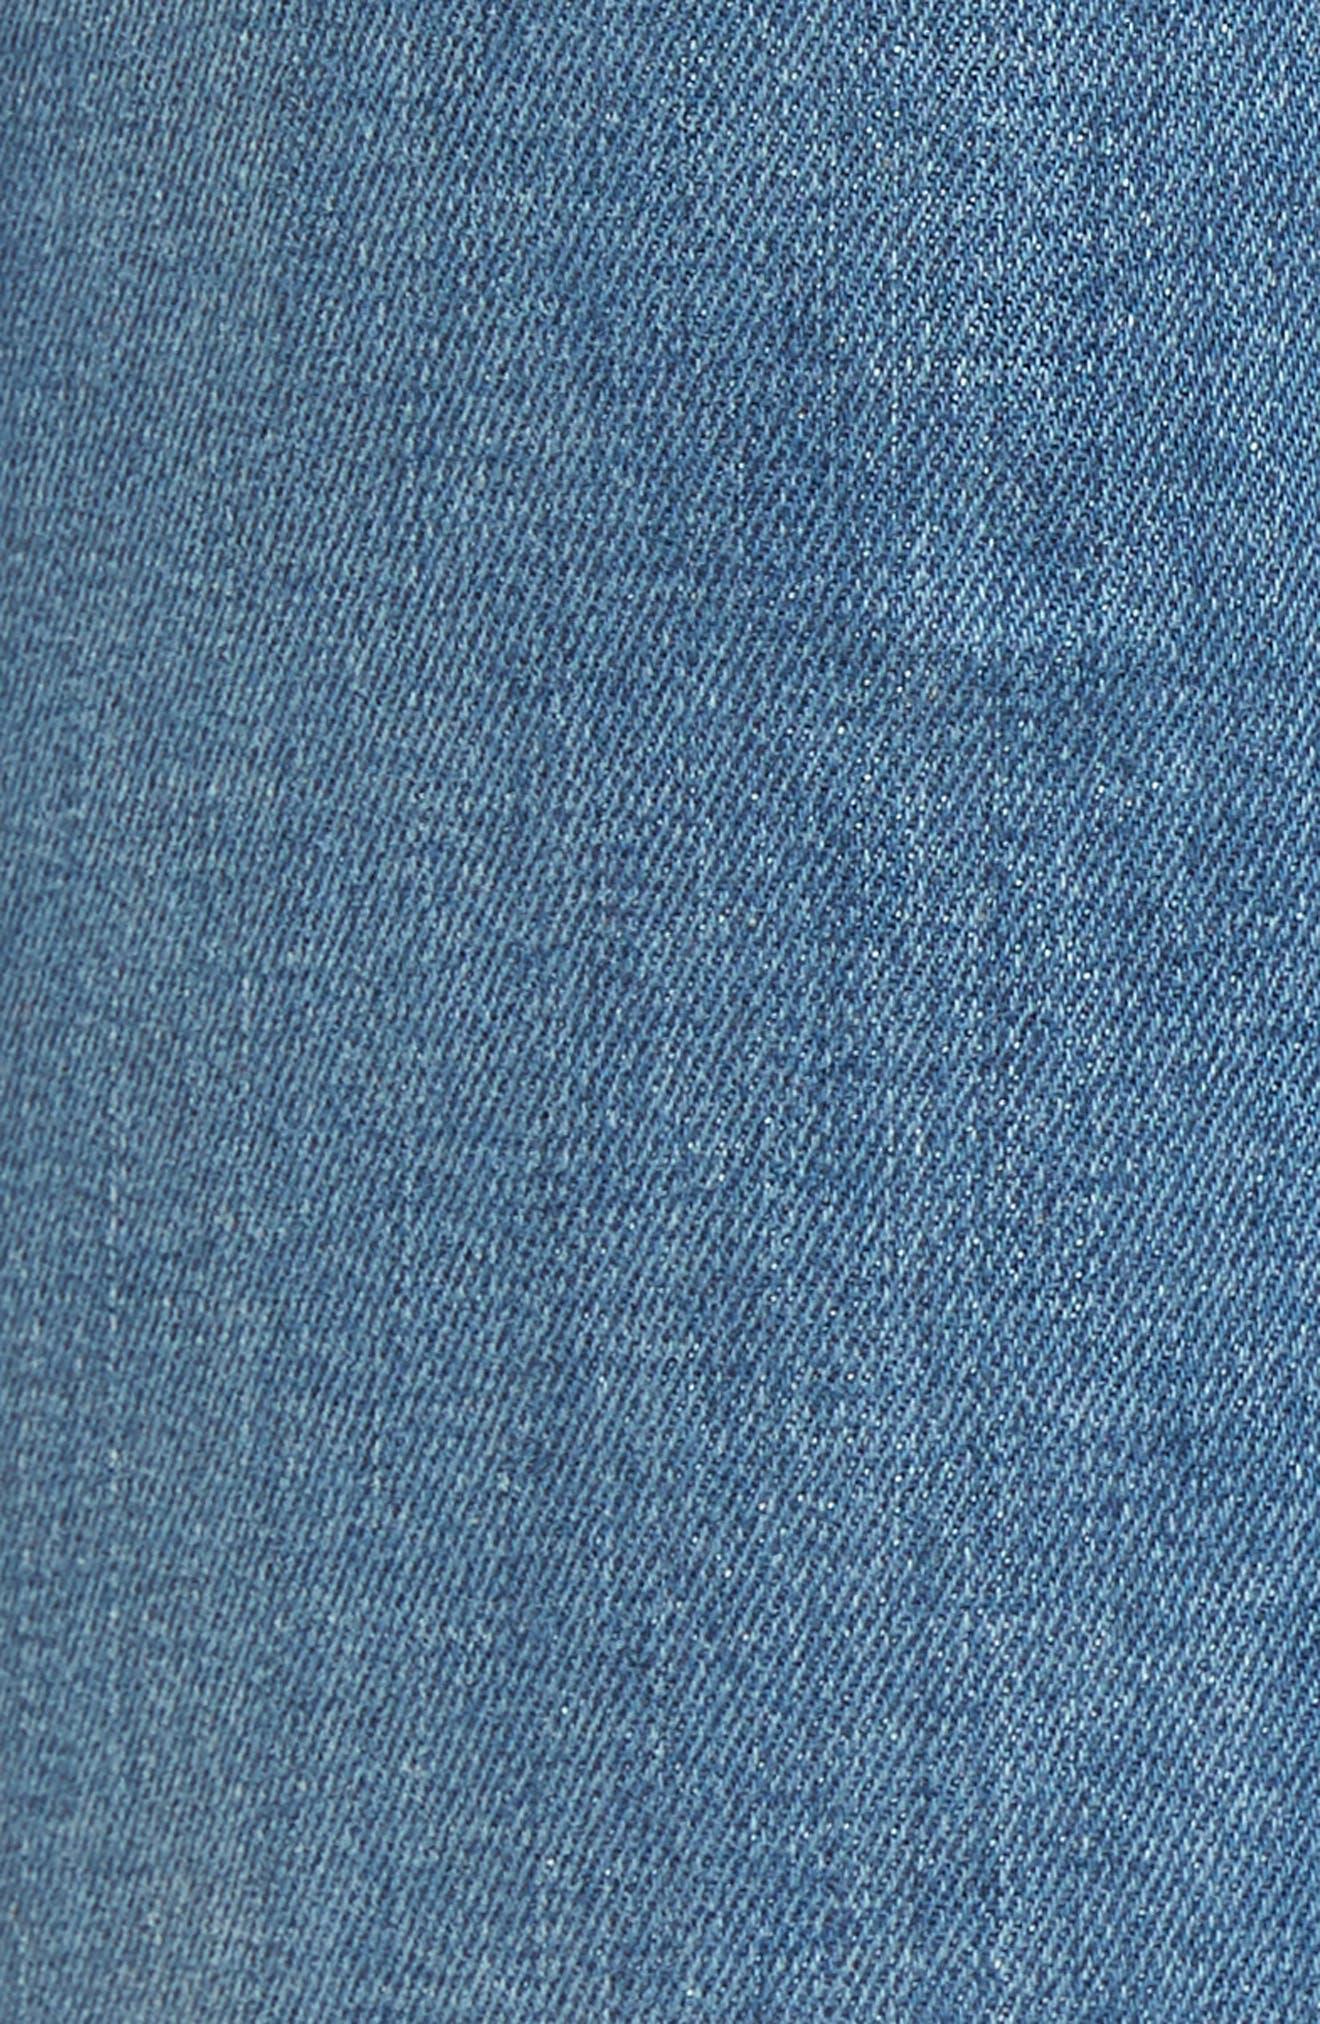 Holly High Waist Raw Hem Crop Wide Leg Jeans,                             Alternate thumbnail 6, color,                             420